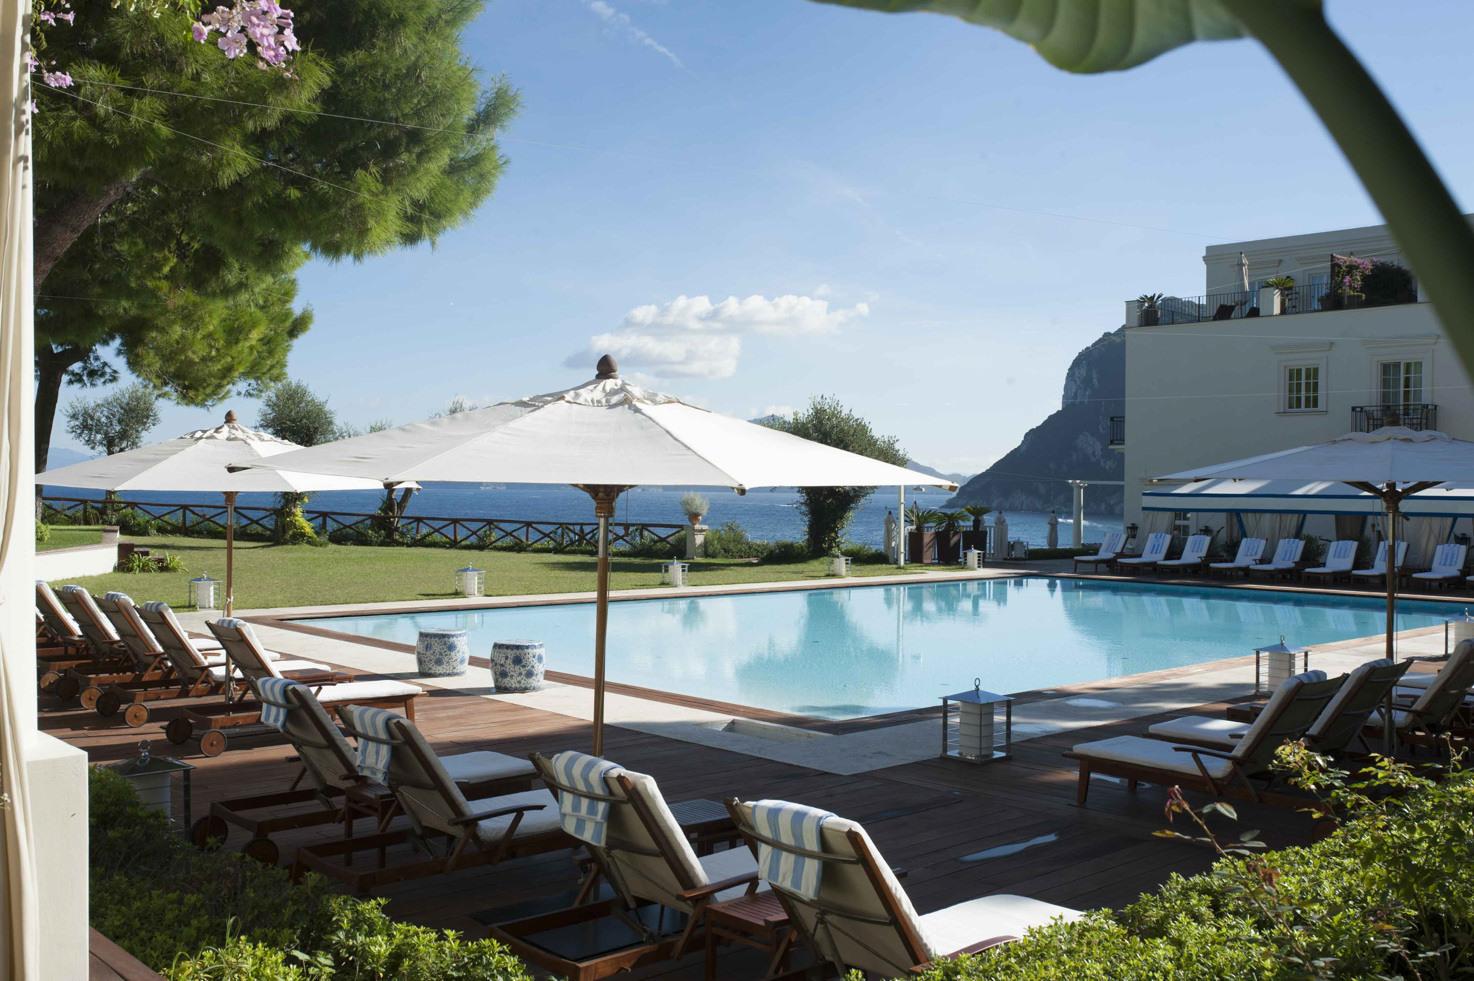 JK Place Hotel swimming pool